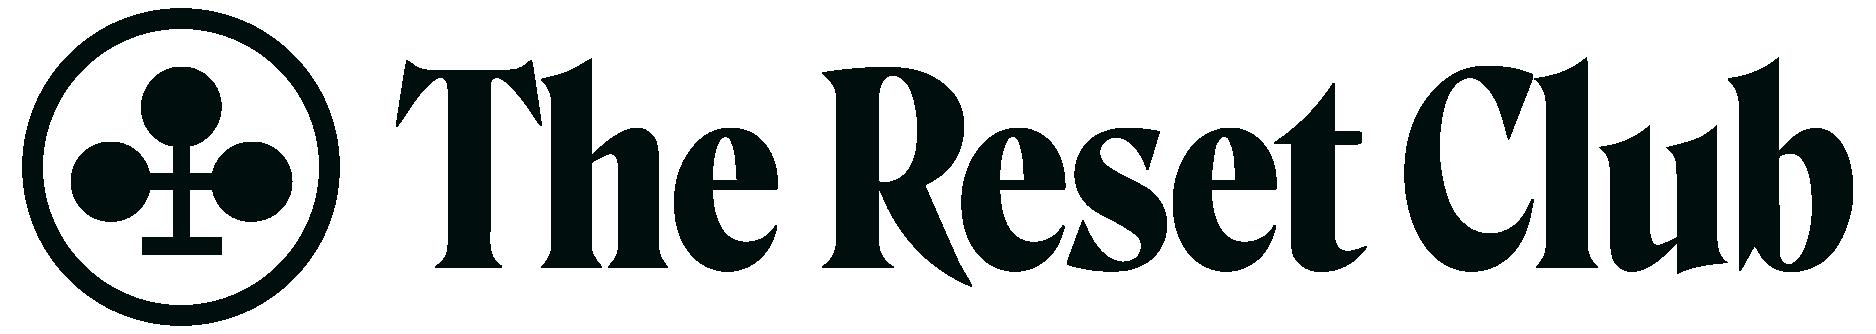 The Reset Club